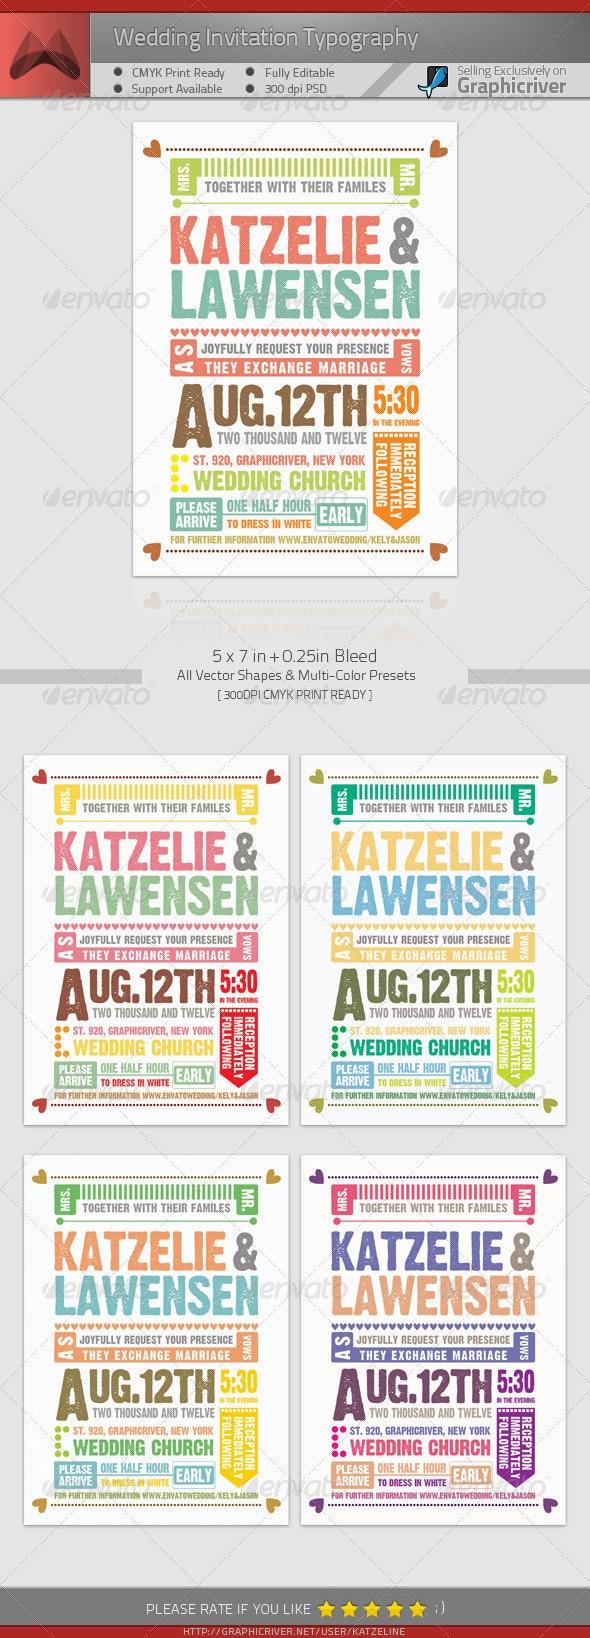 Wedding Invitation Typography - Weddings Cards & Invites